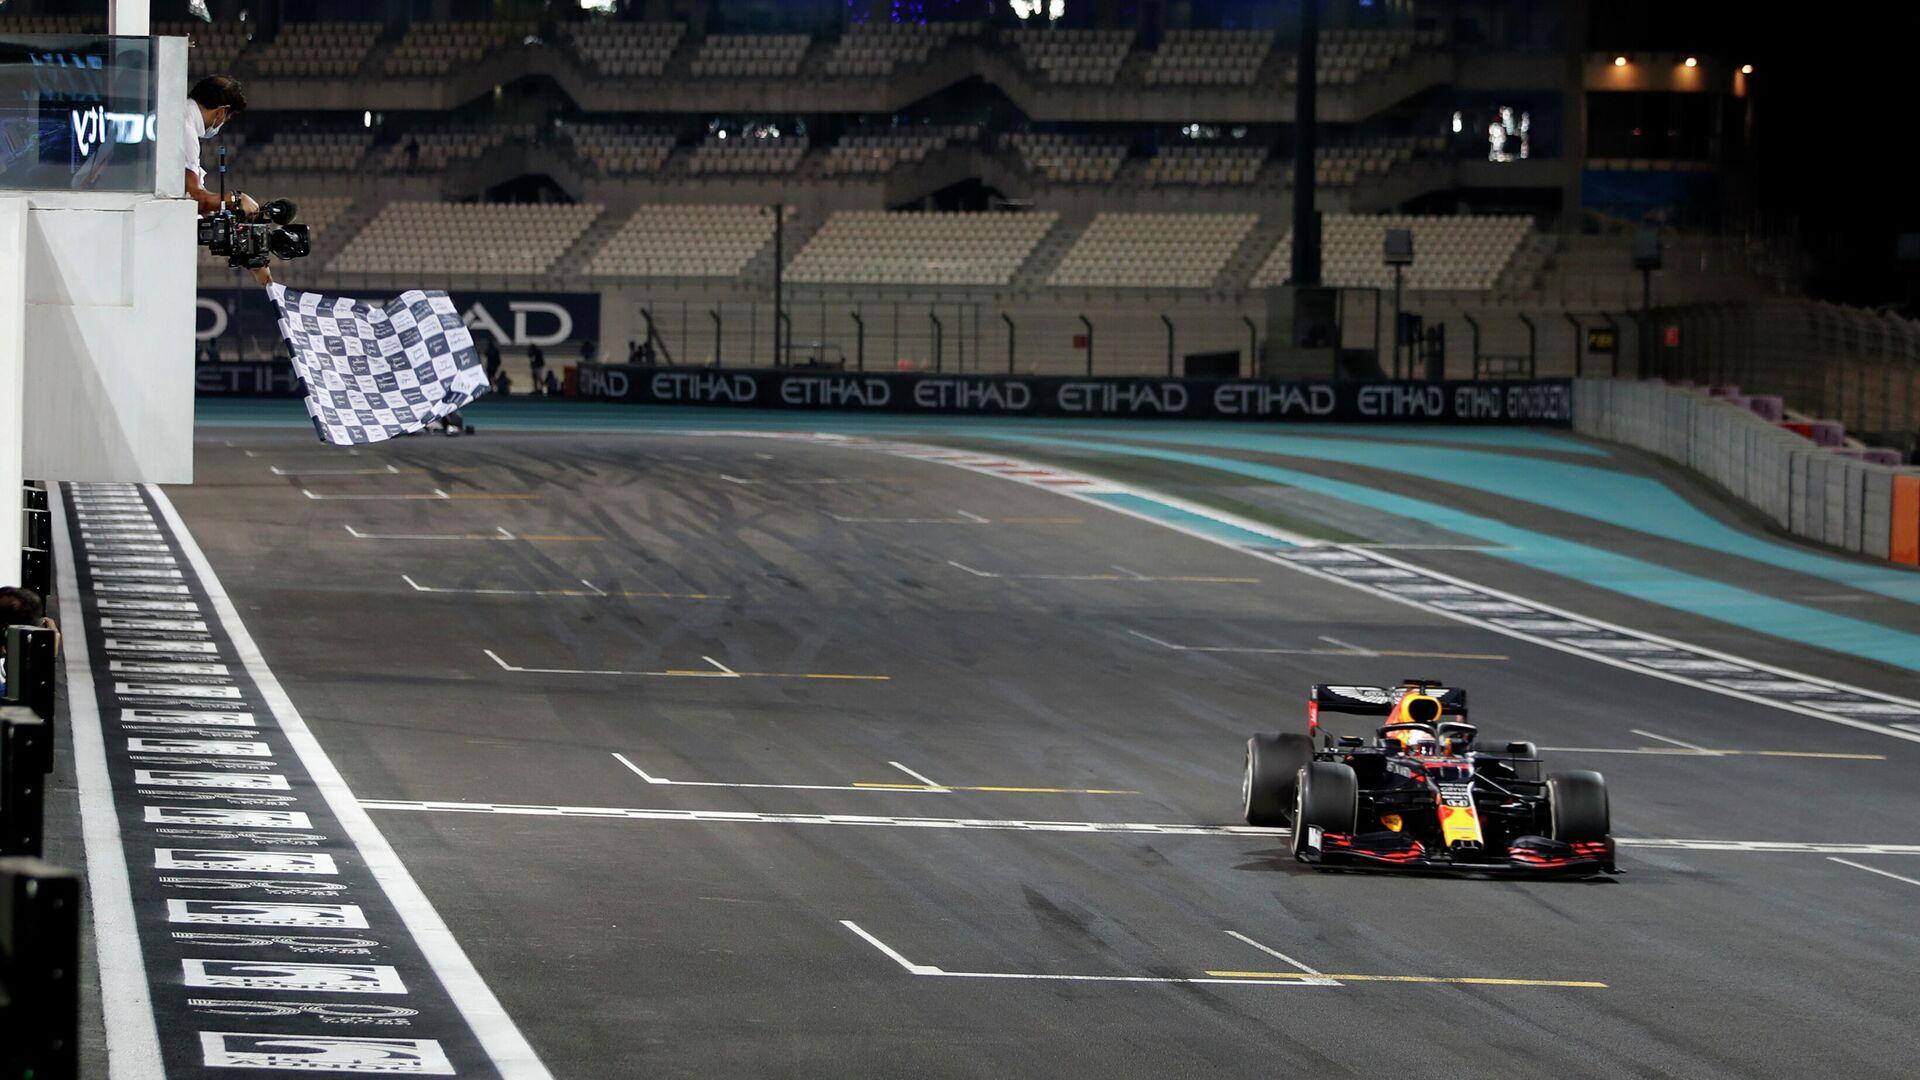 Гран-при Формулы-1 в Абу-Даби - РИА Новости, 1920, 14.12.2020